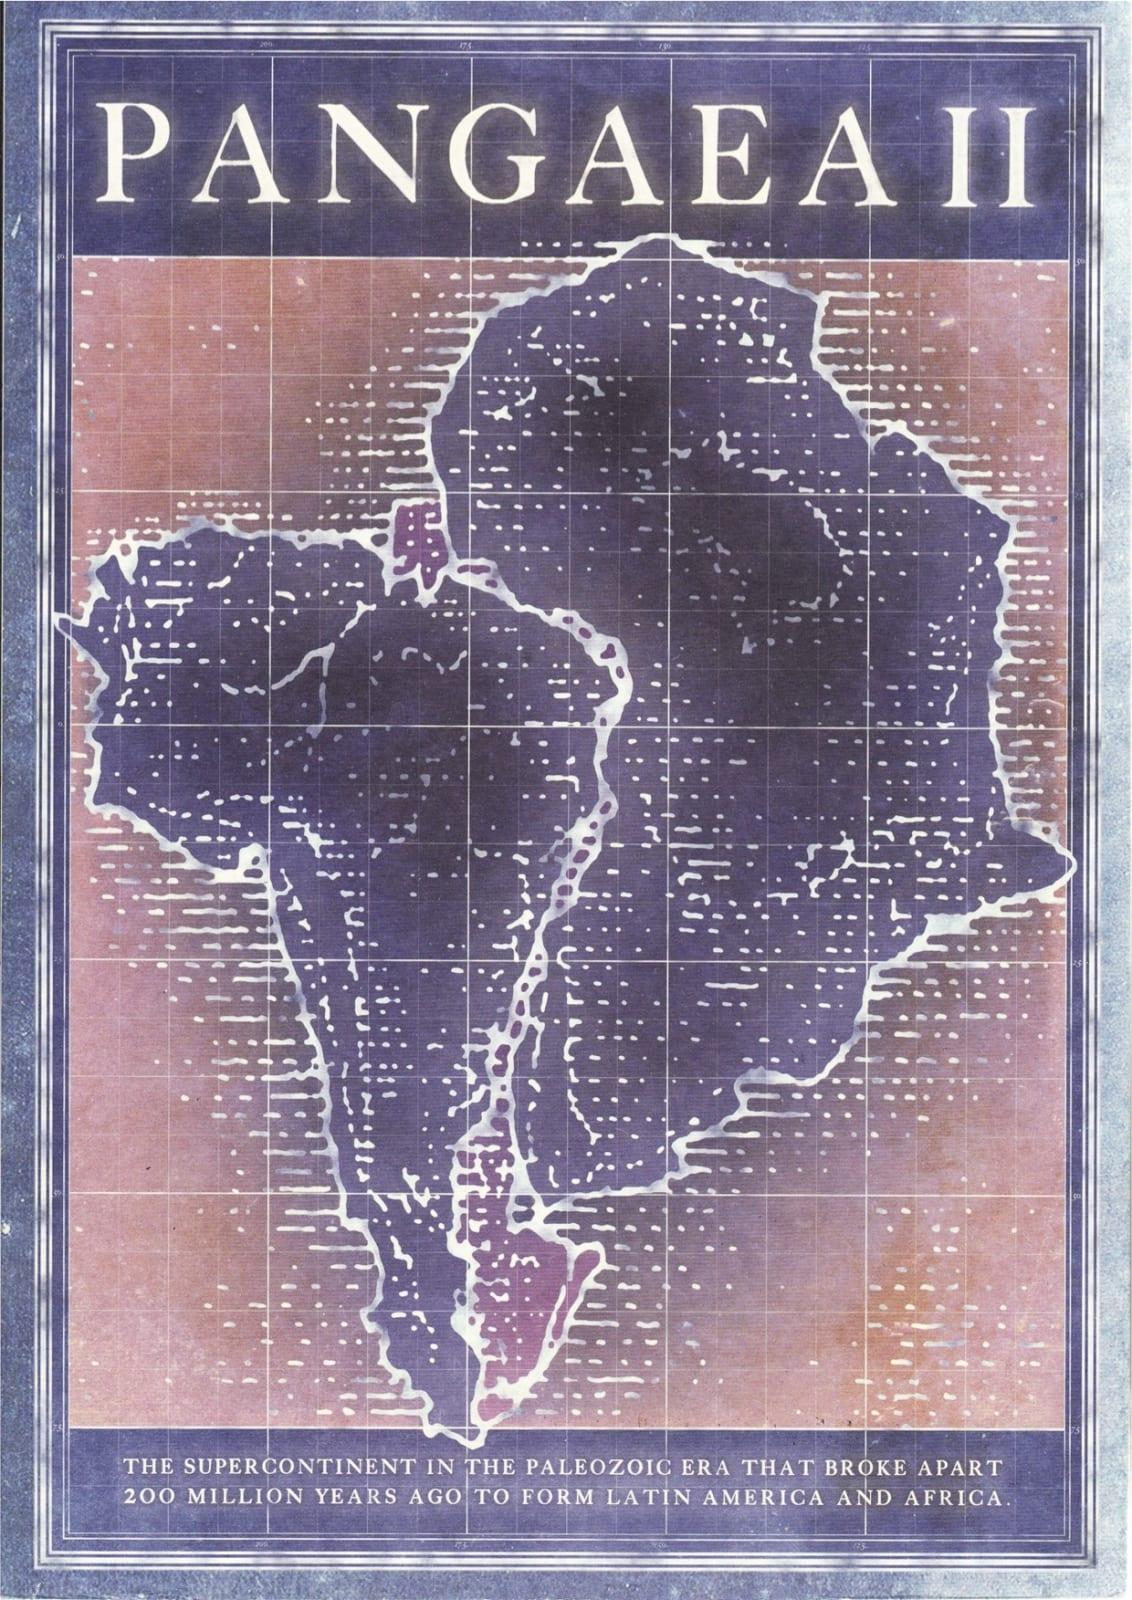 Pangaea II: New Art From Africa and Latin America Saatchi Gallery